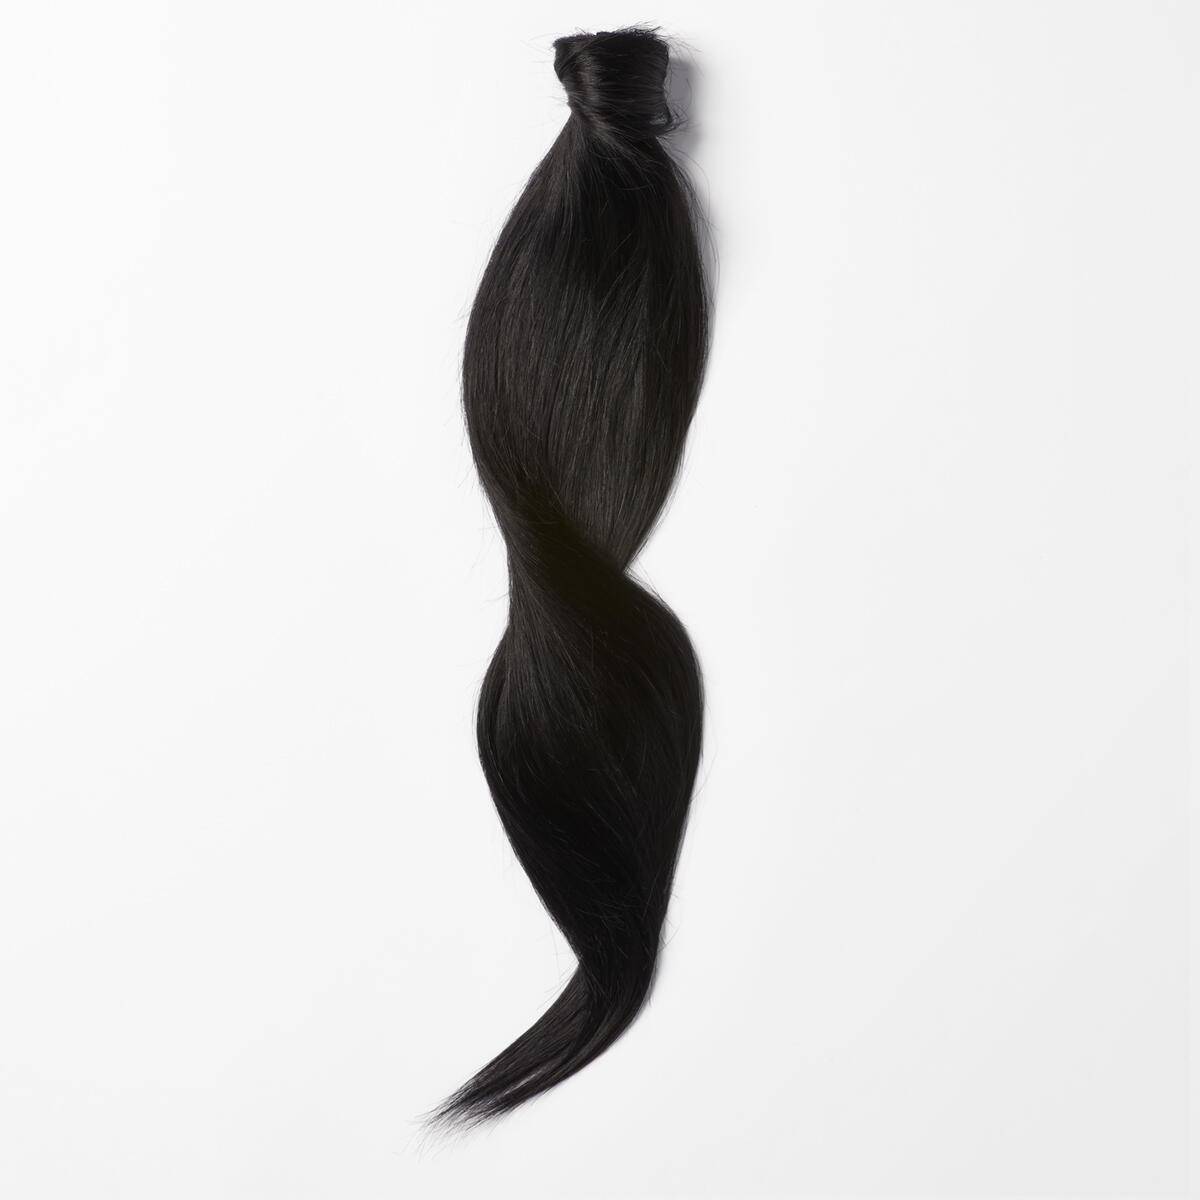 Sleek Clip-in Ponytail Ponytail made of real hair 1.0 Black 40 cm